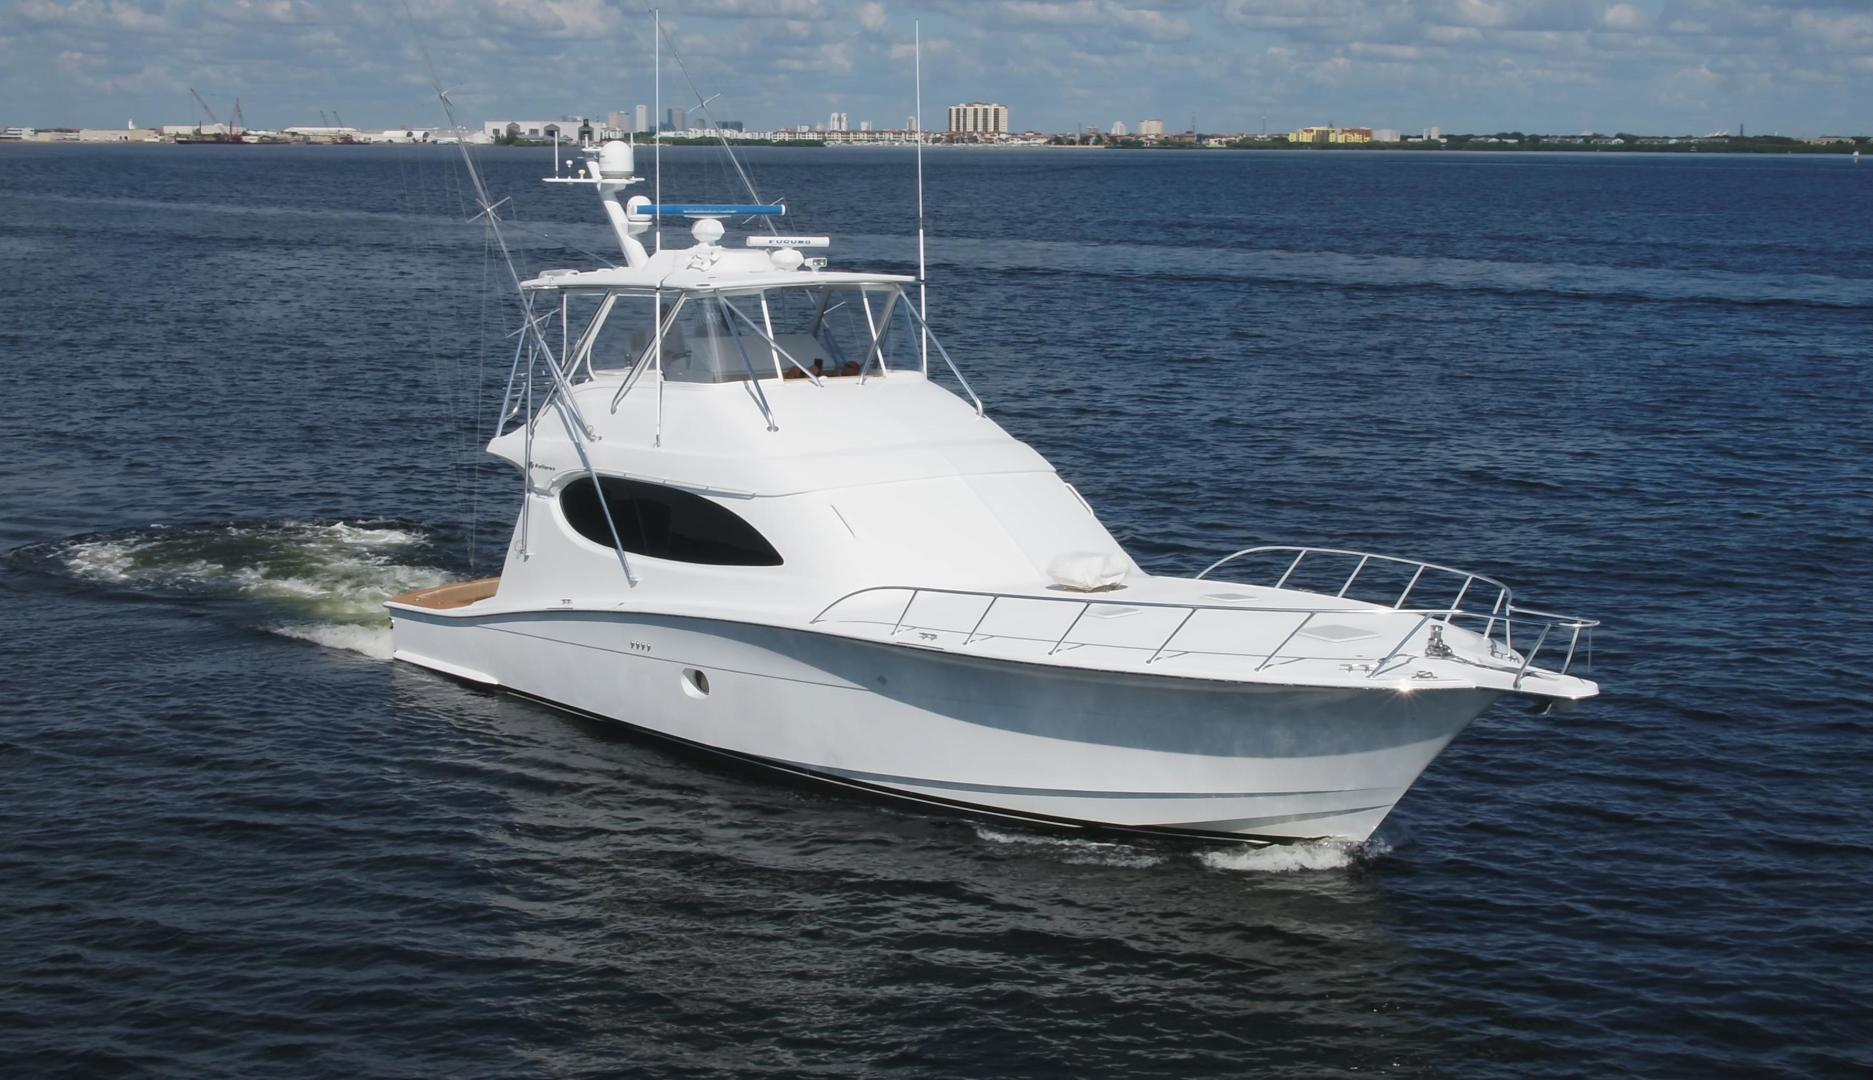 Hatteras-Convertible 2006-ON TARGET Key West-Florida-United States-1468205 | Thumbnail